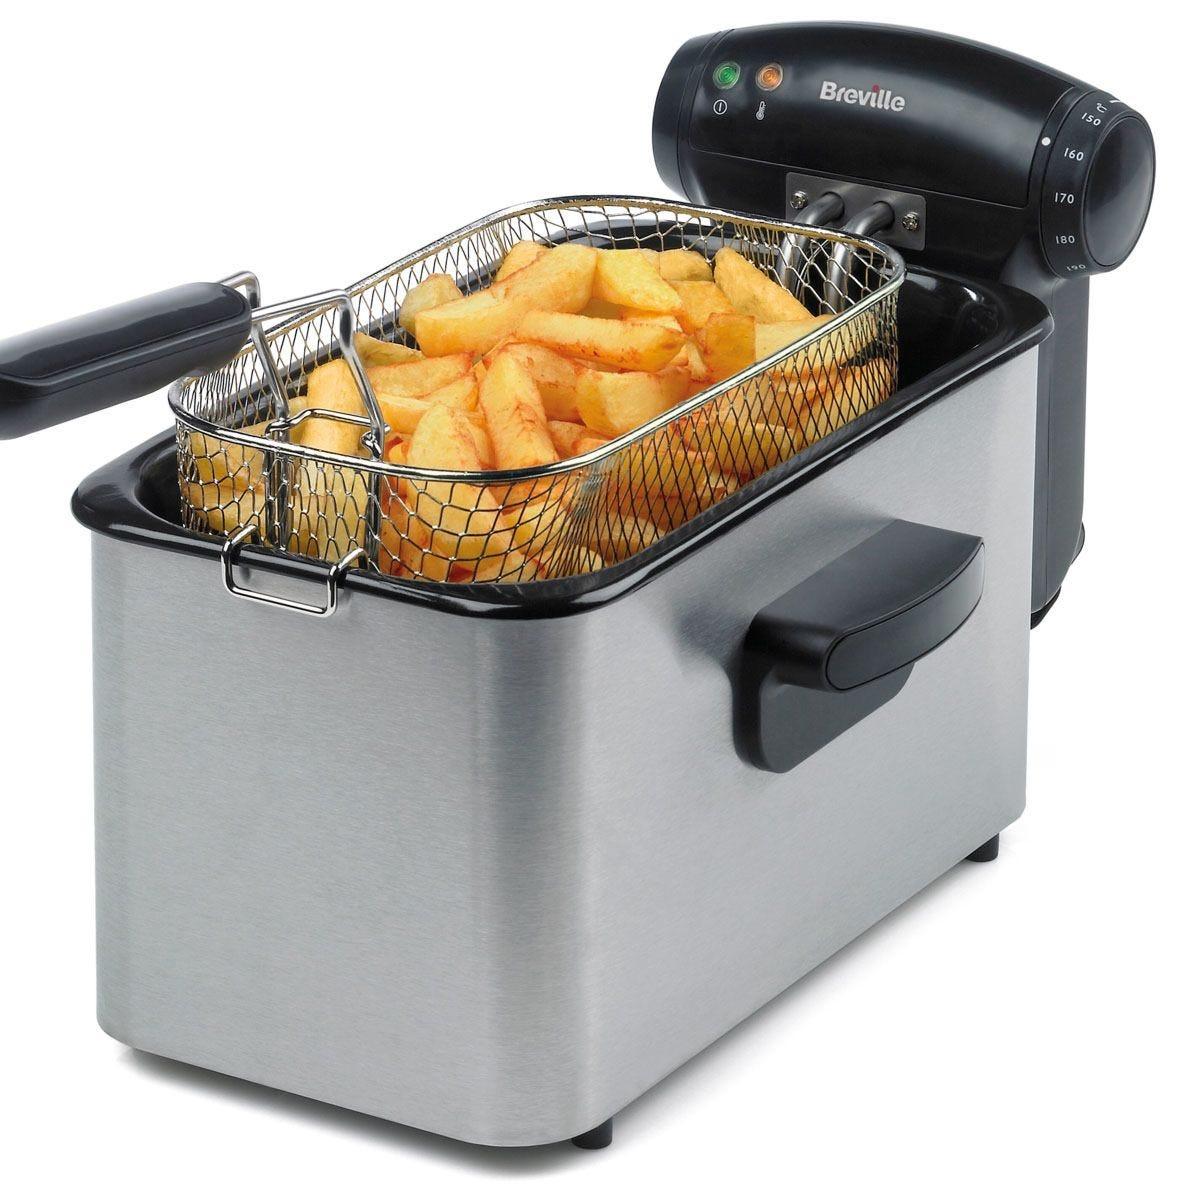 Breville VDF100 3L Professional 2000W Stainless Steel Fryer – Silver/Black